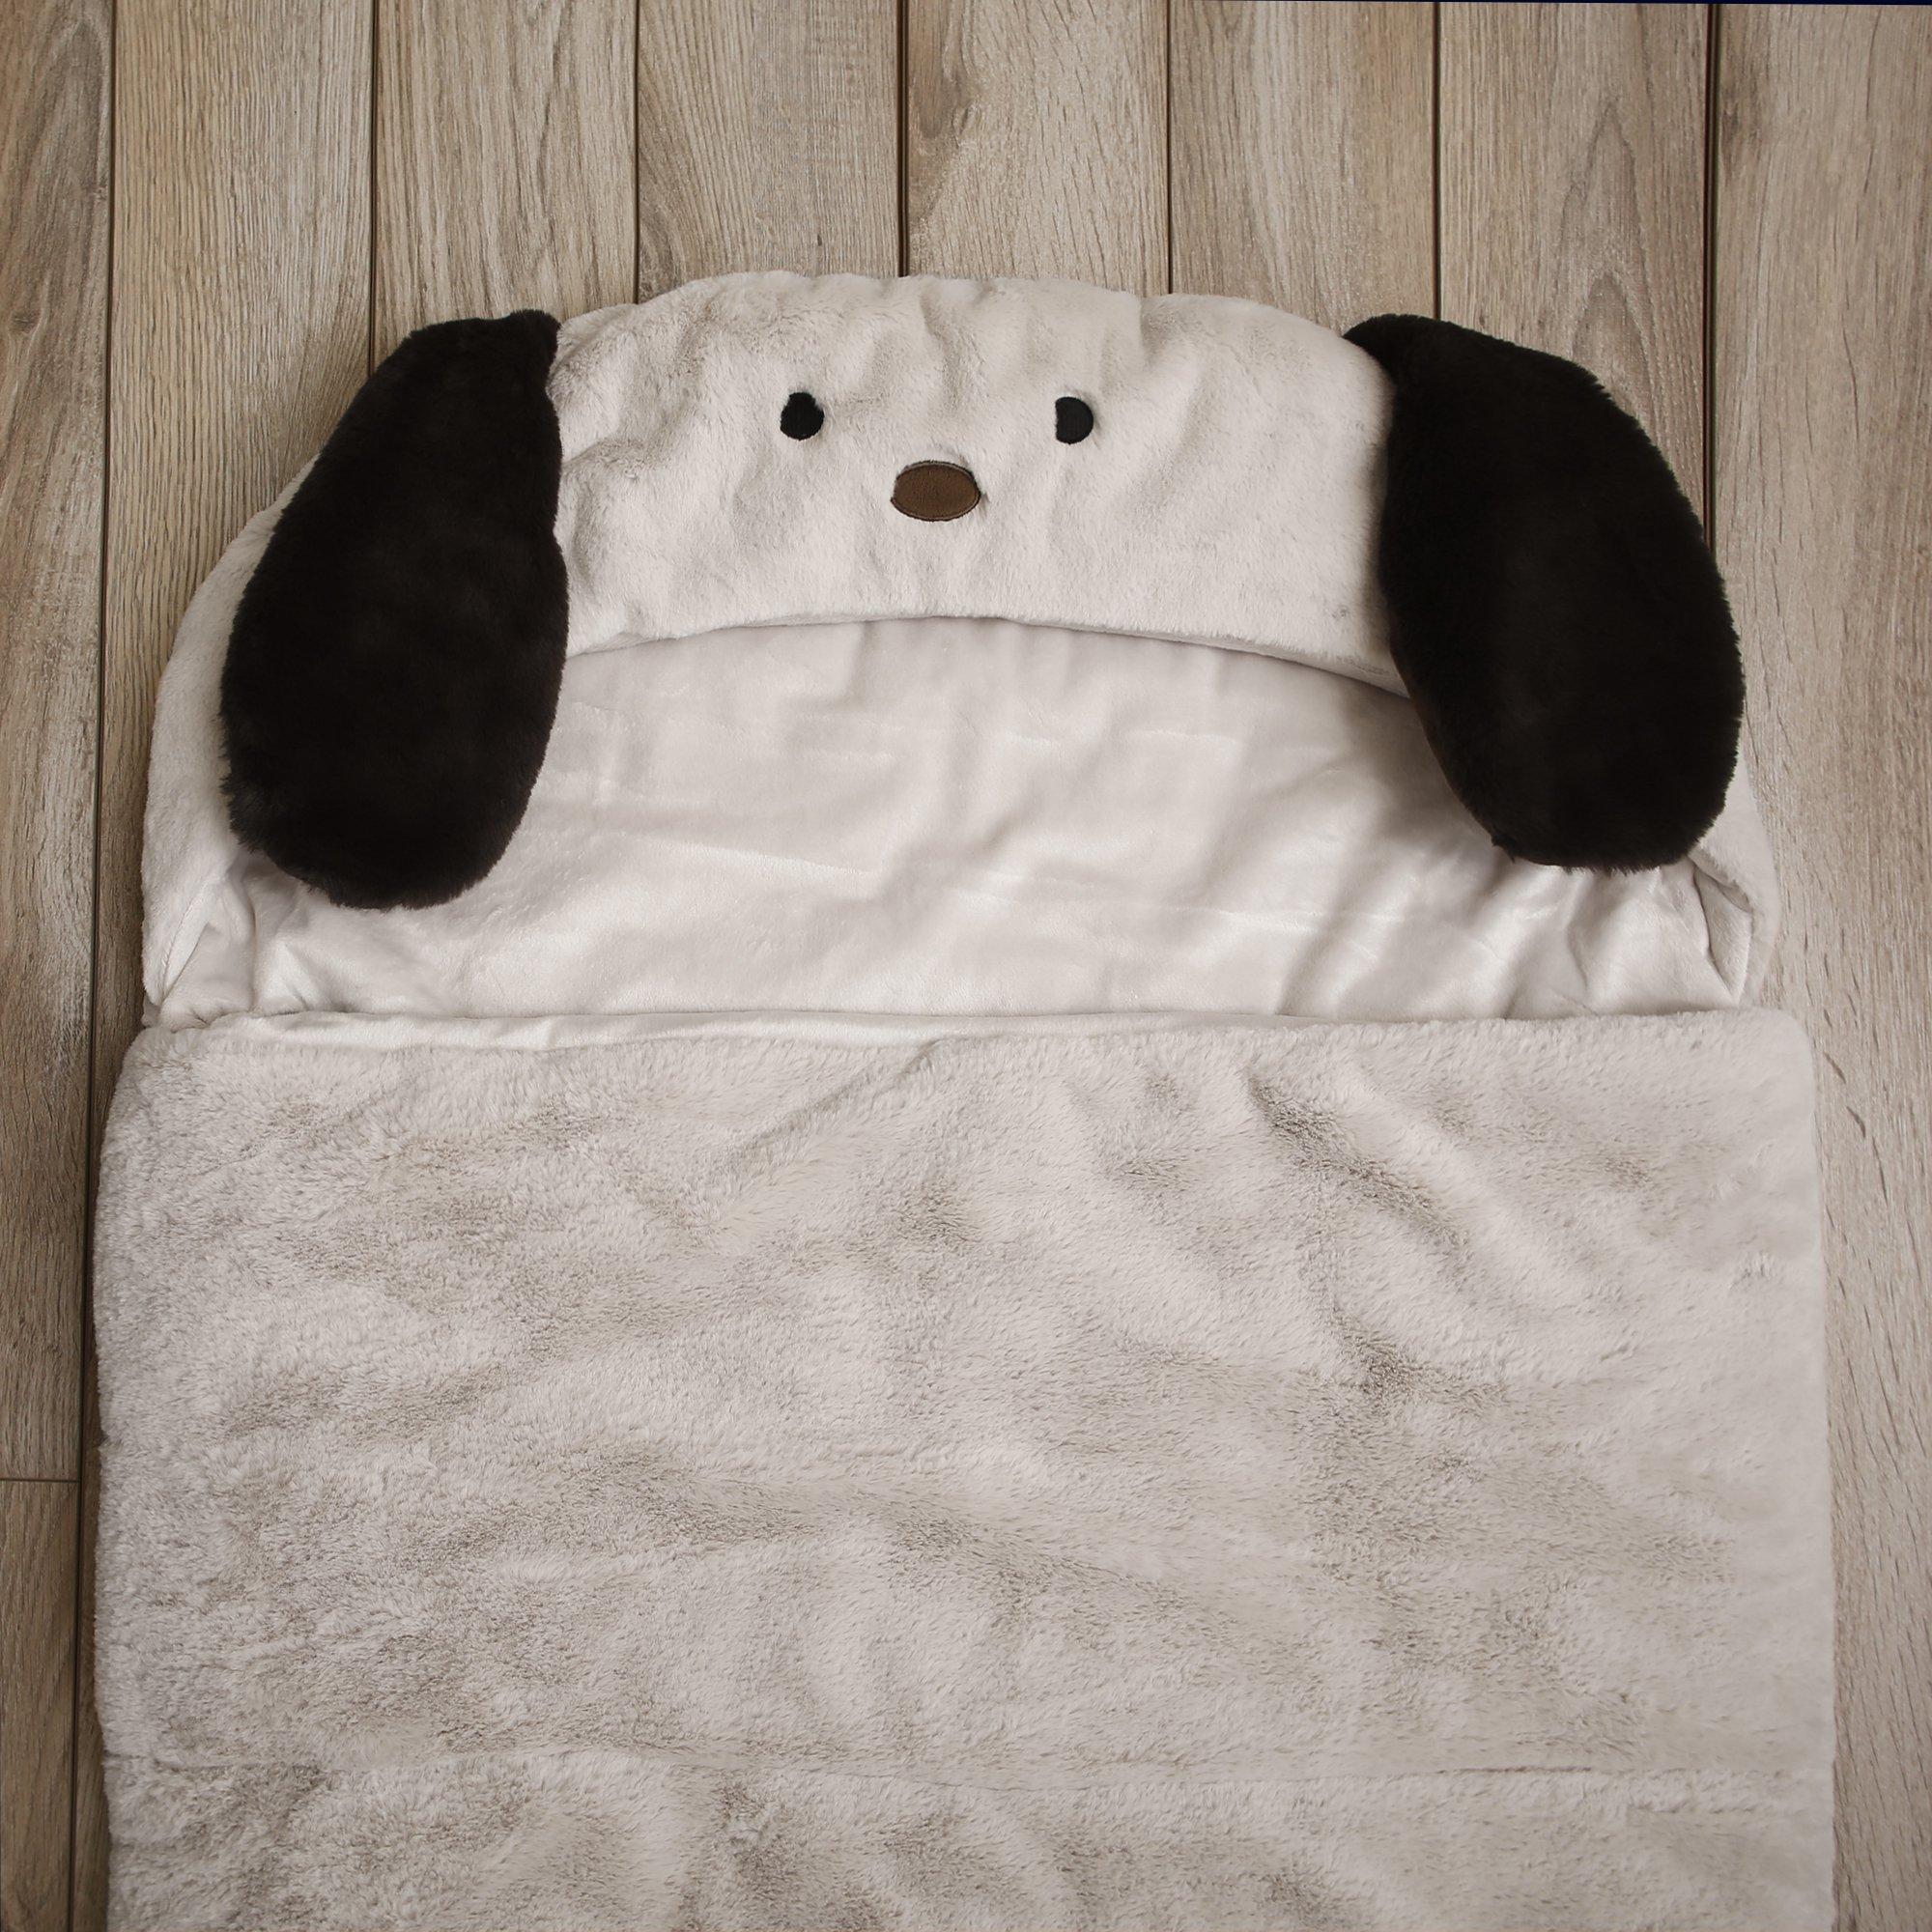 Best Home Fashion Plush Faux Fur Hooded Dog Animal Sleeping Bag - Taupe - 27''W x 59''L - (1 Sleeping Bag) by Best Home Fashion (Image #4)